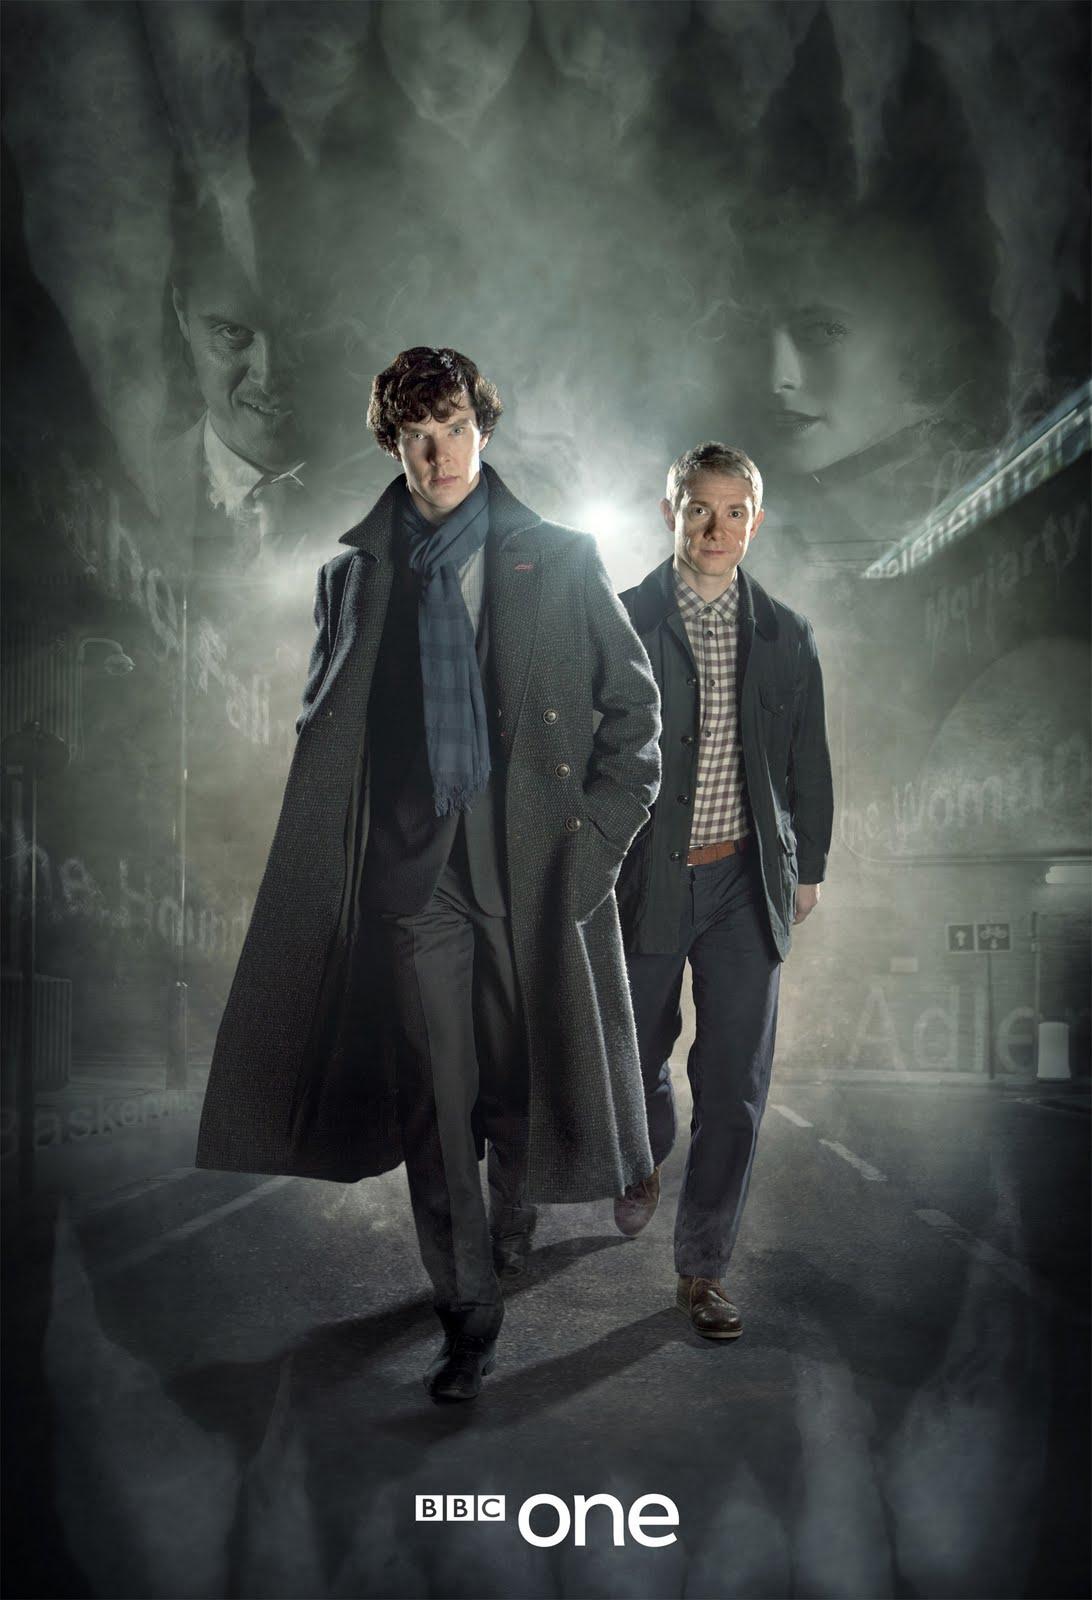 sherlock season 2 of tv series download in hd 720p